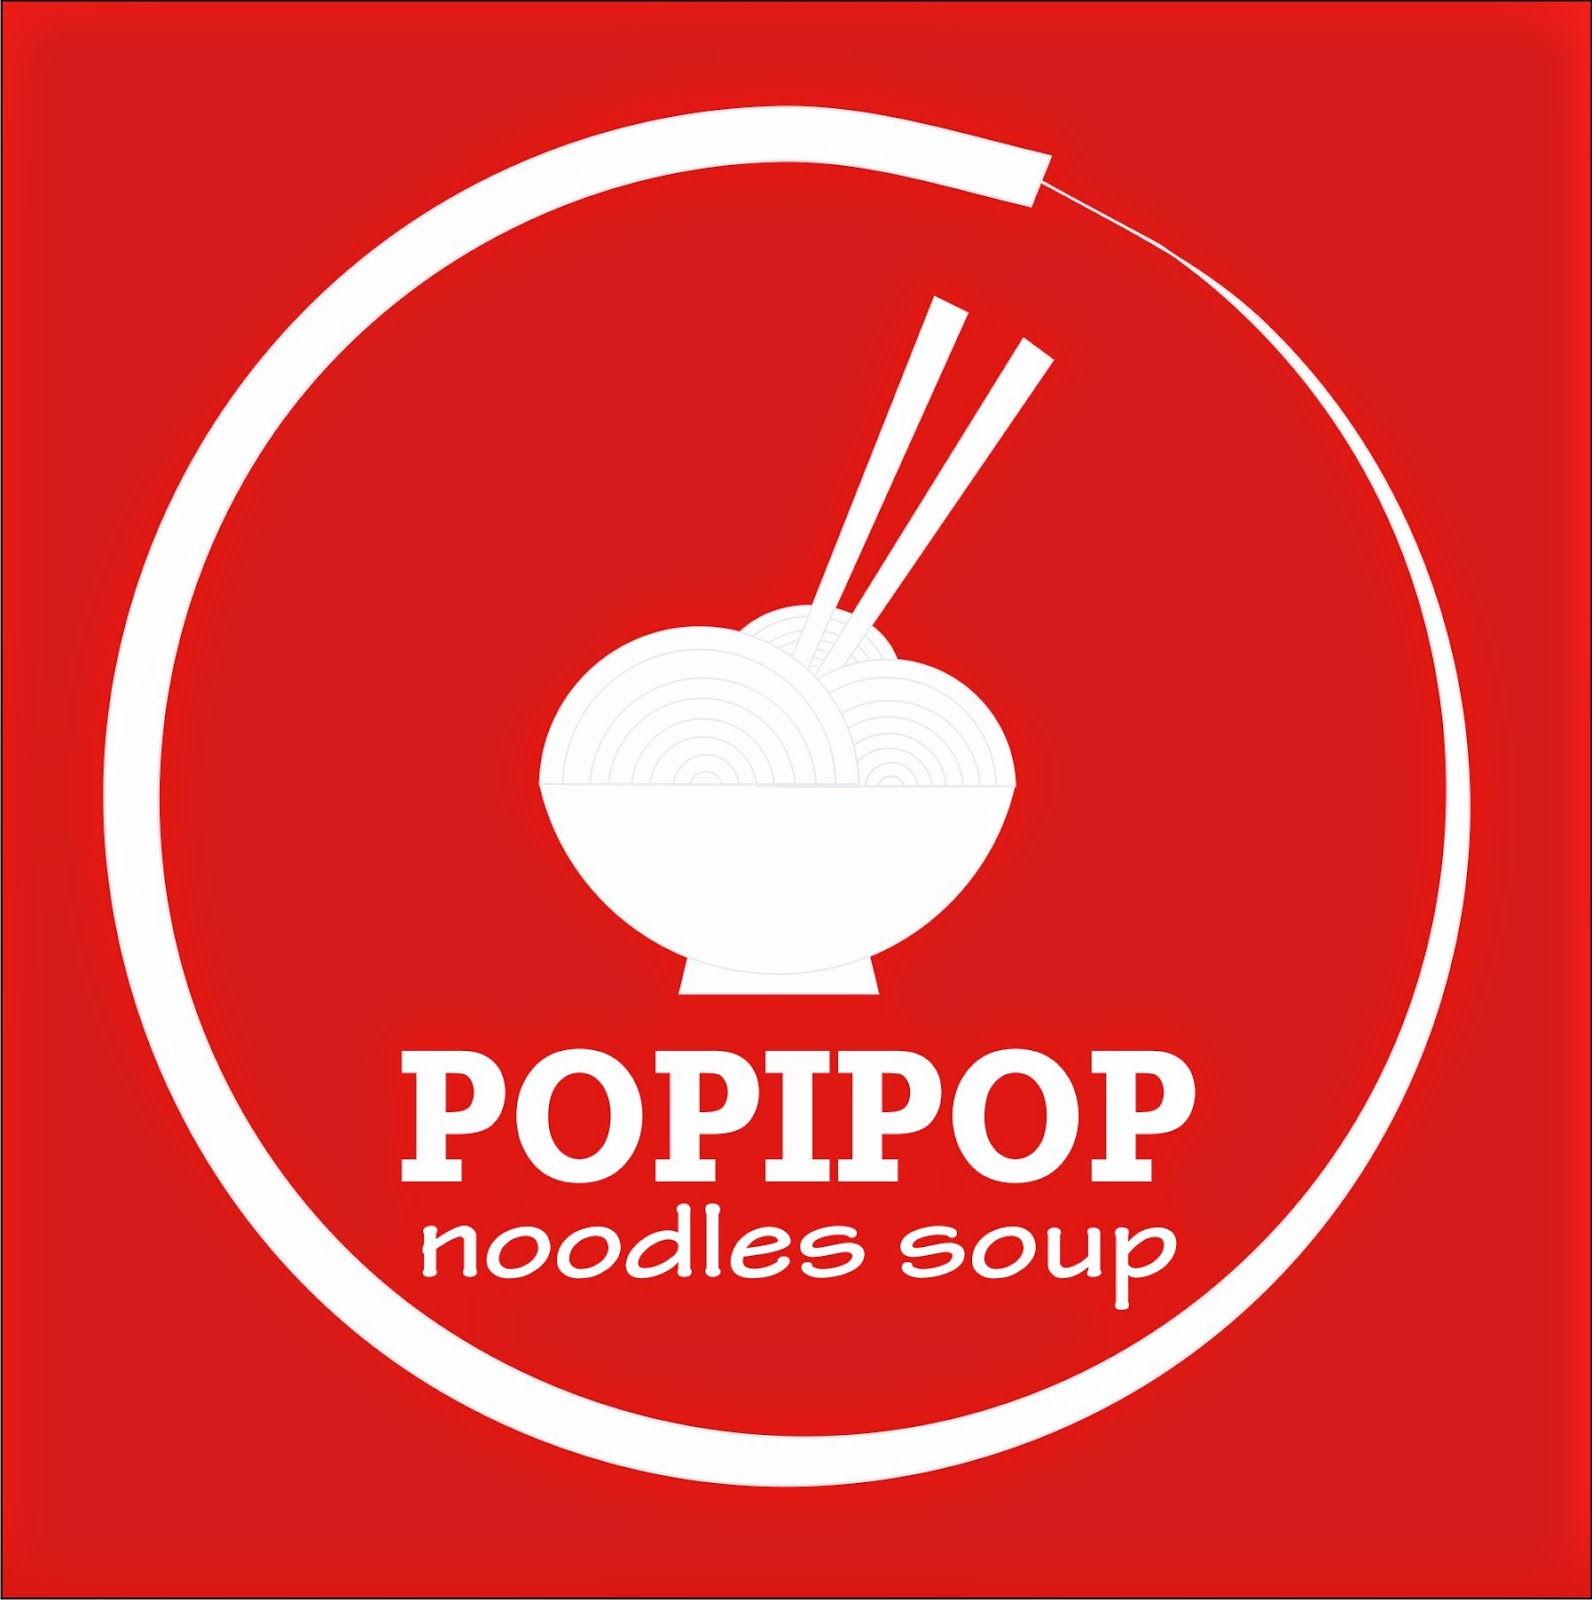 Lowongan Kerja Juru Masak dan Waiter di Popipop Noodles Soup – Yogyakarta